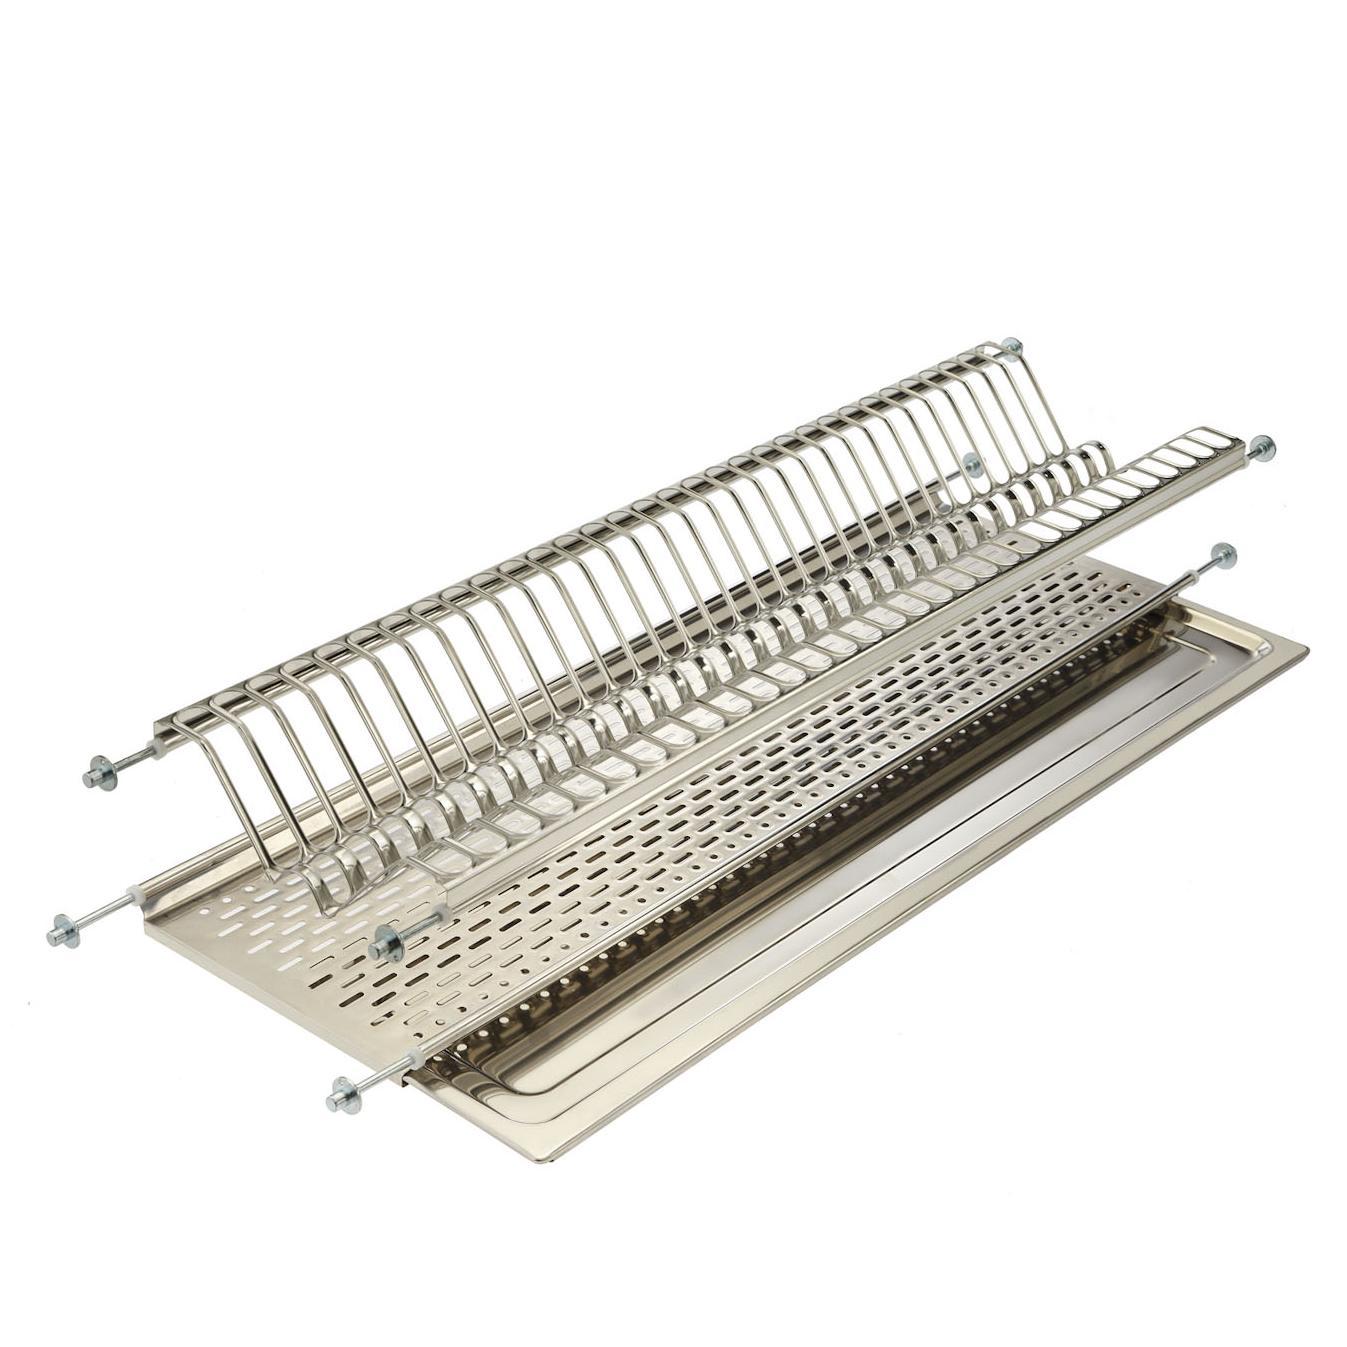 257-10 посудосушители 800 мм хром калибра